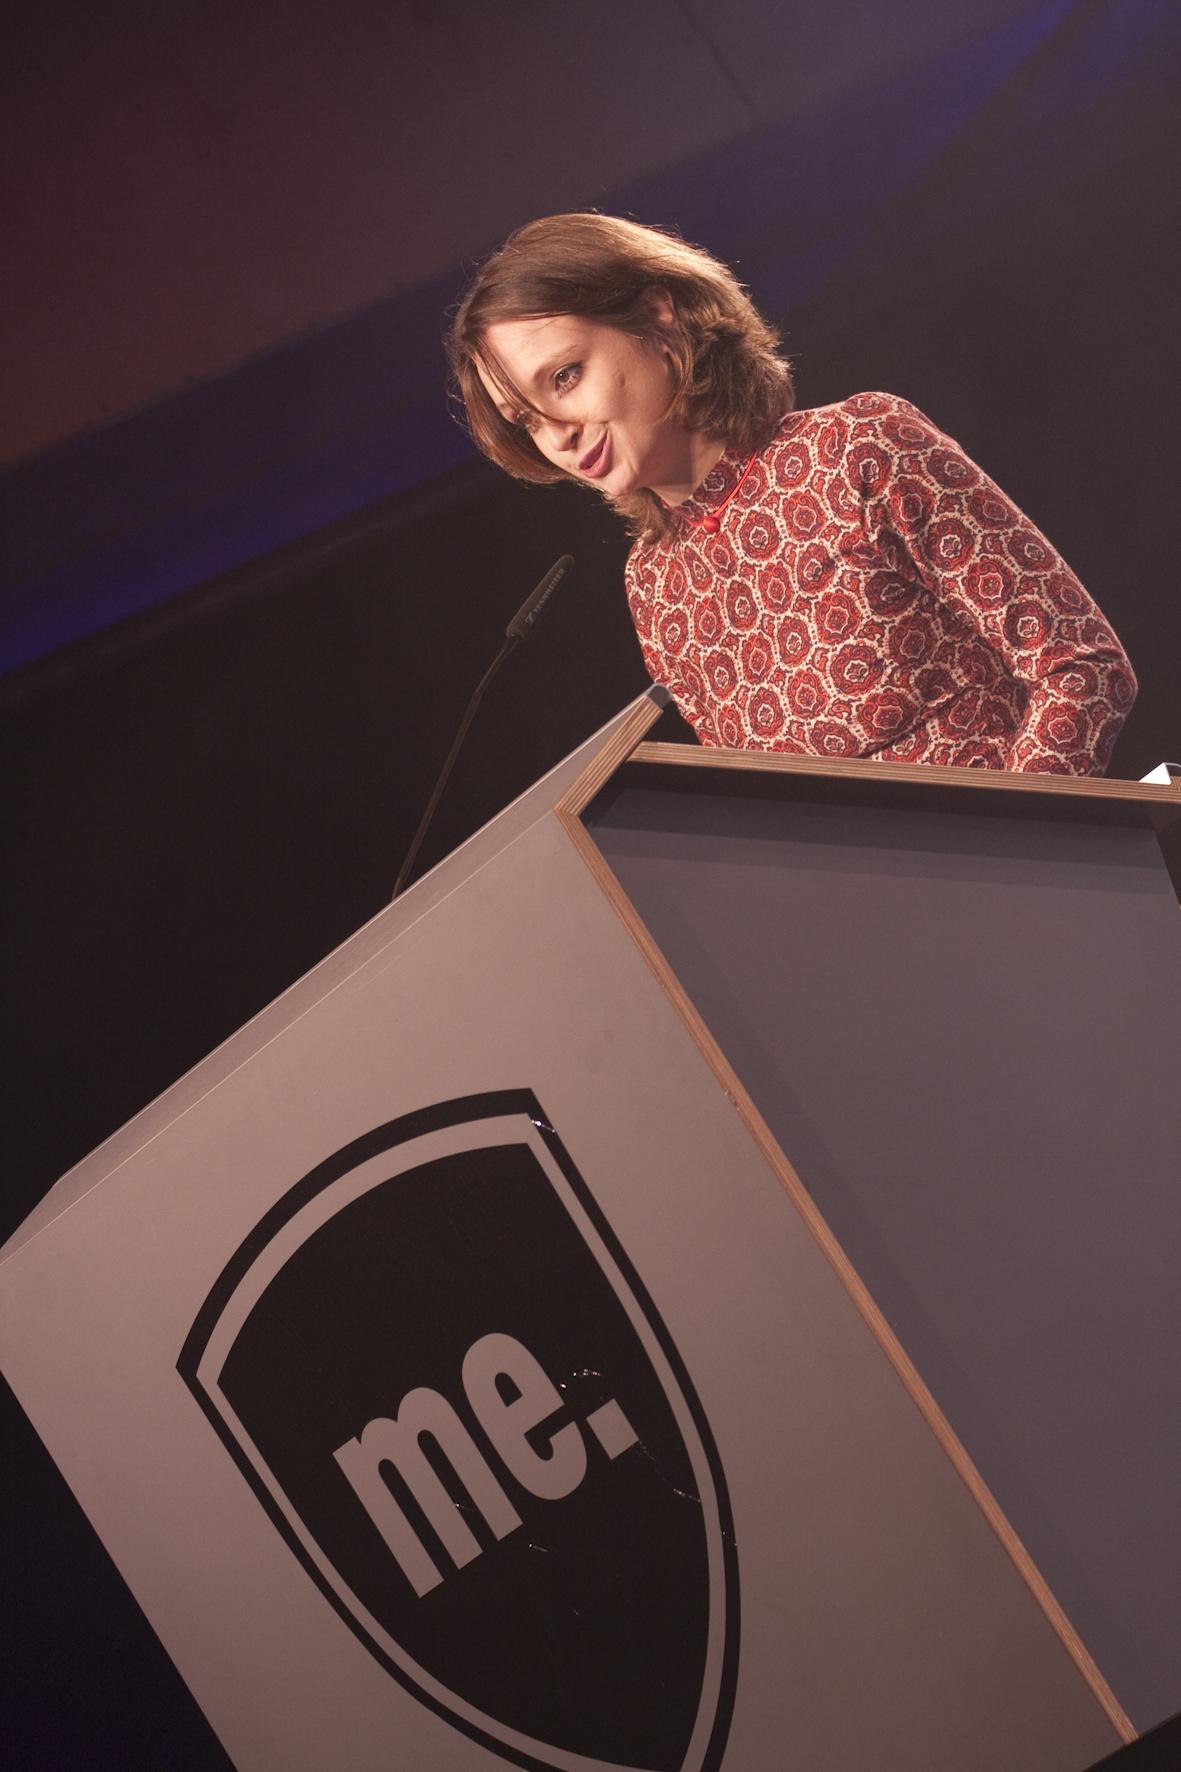 Mimi Müller-Westernhagen kündigt den Award für Fred Perry an.